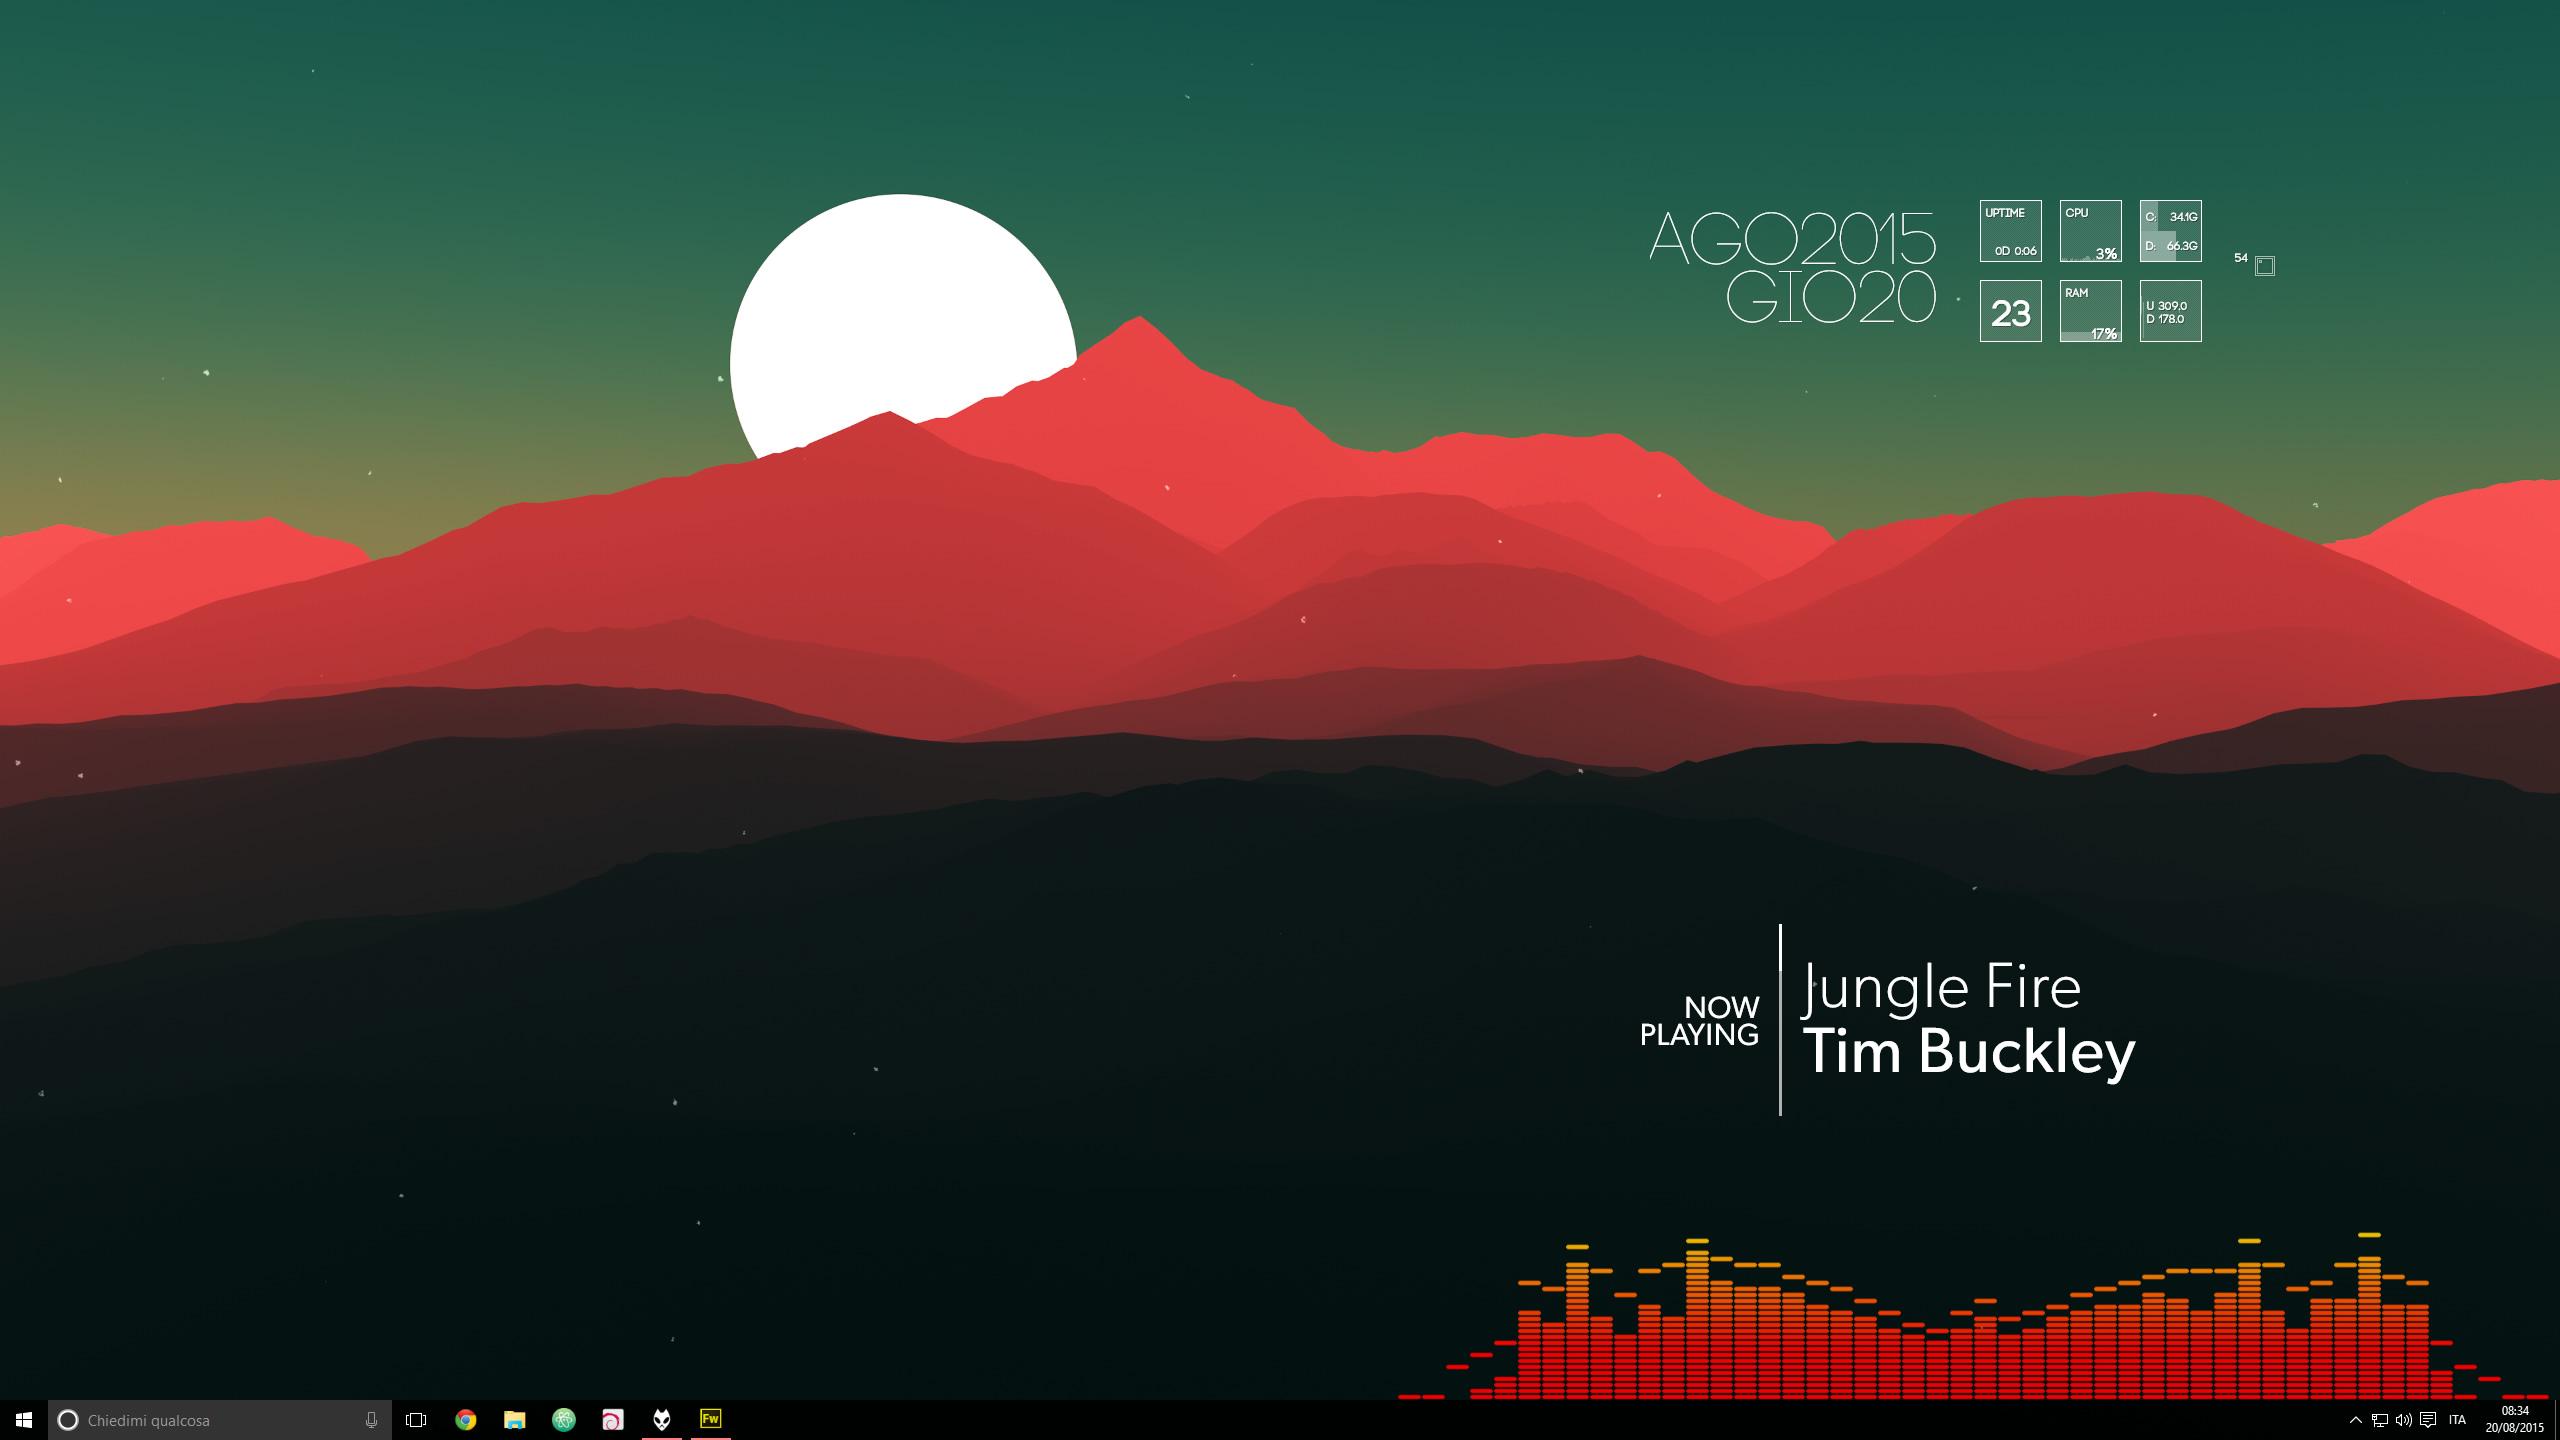 10th dimension windows 10 desktop by starise